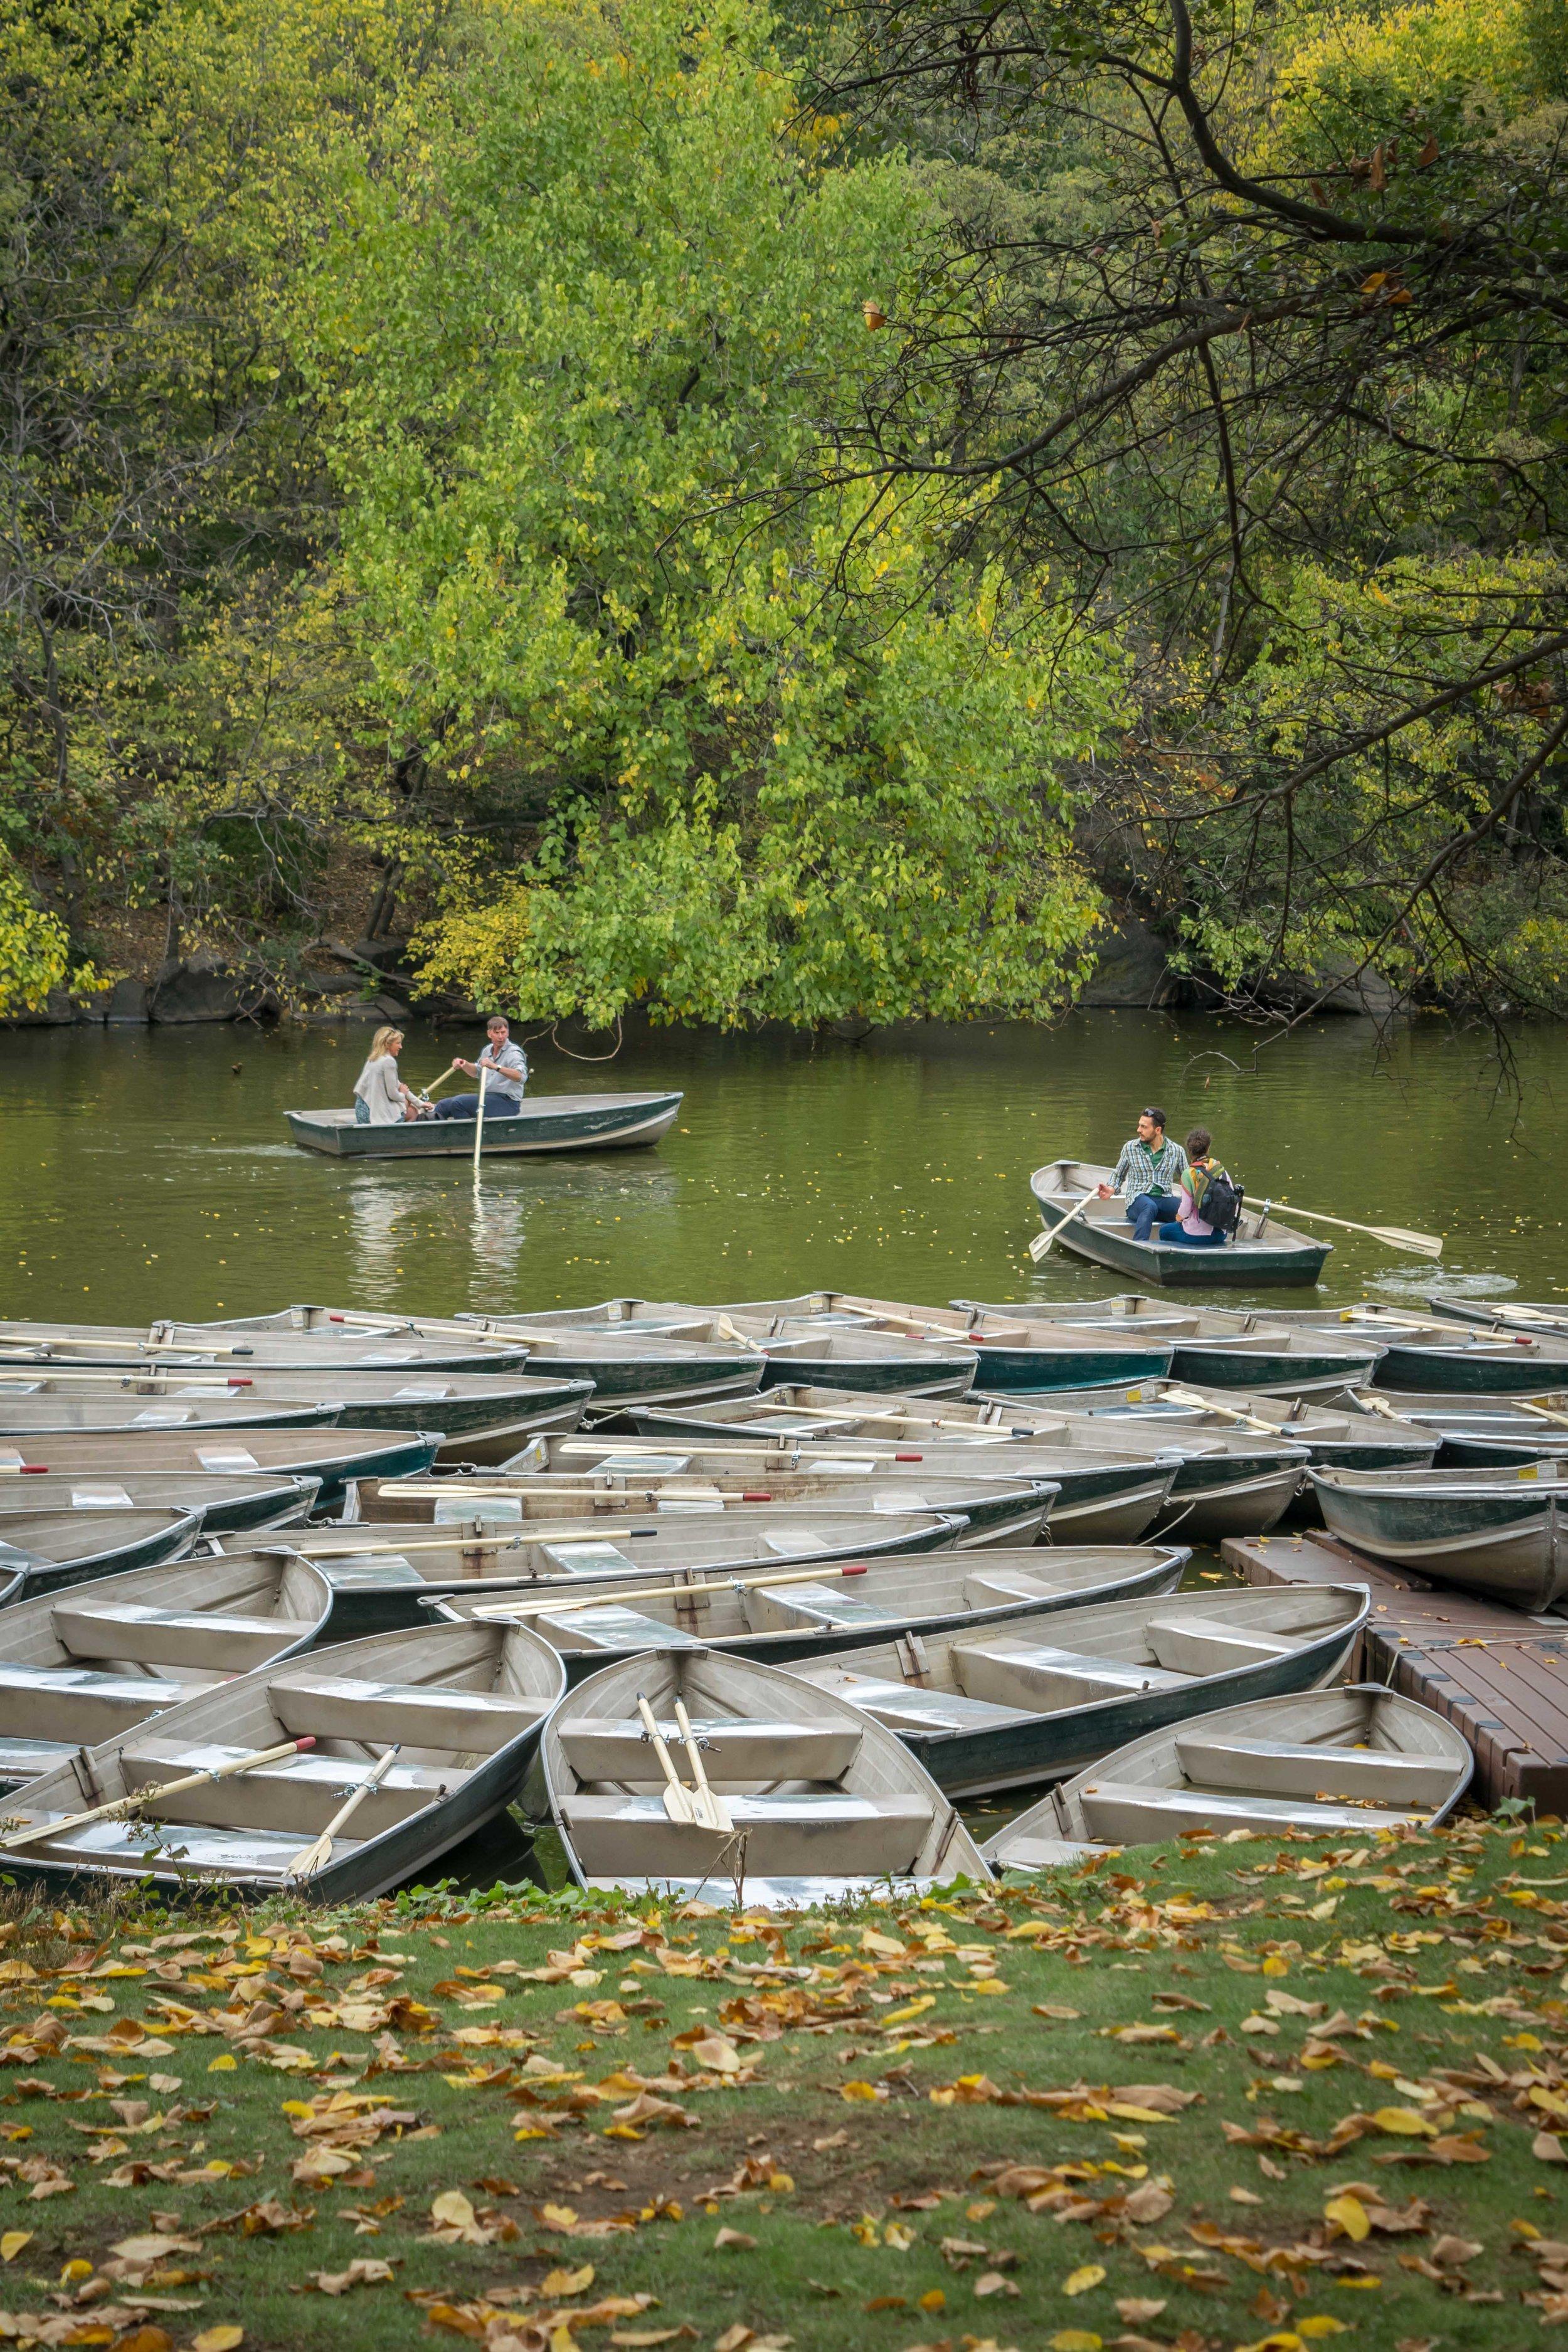 Rowboats on The Lake